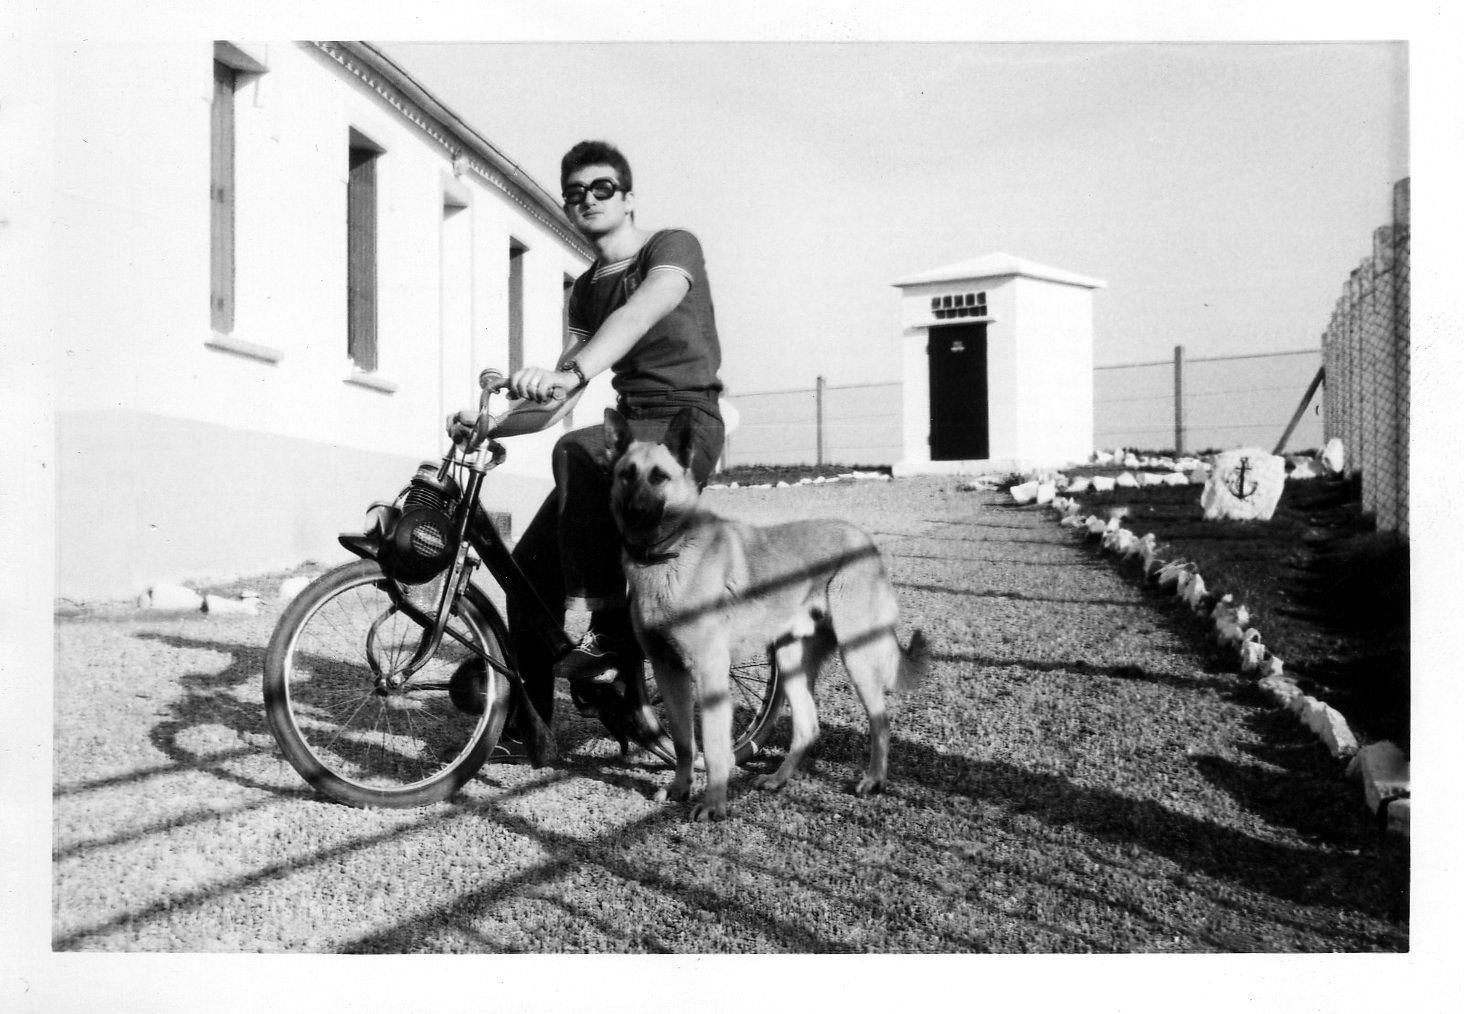 Station Marine de Brezellec Cap Sizun 1970